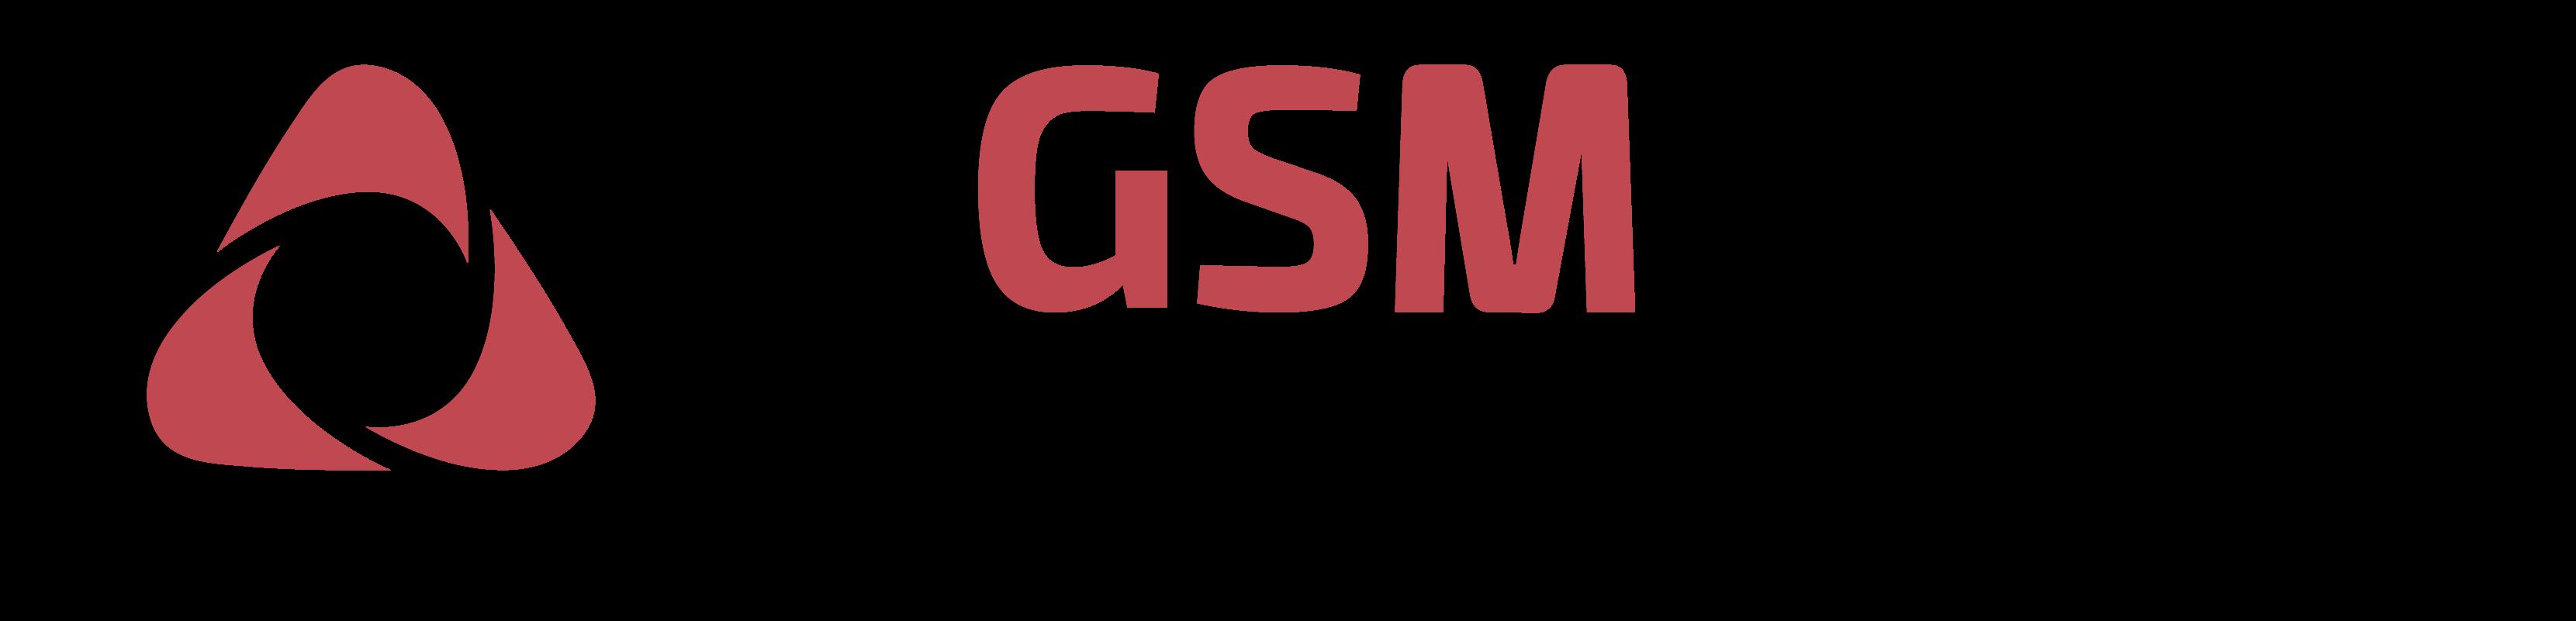 GSM Schweisstechnik